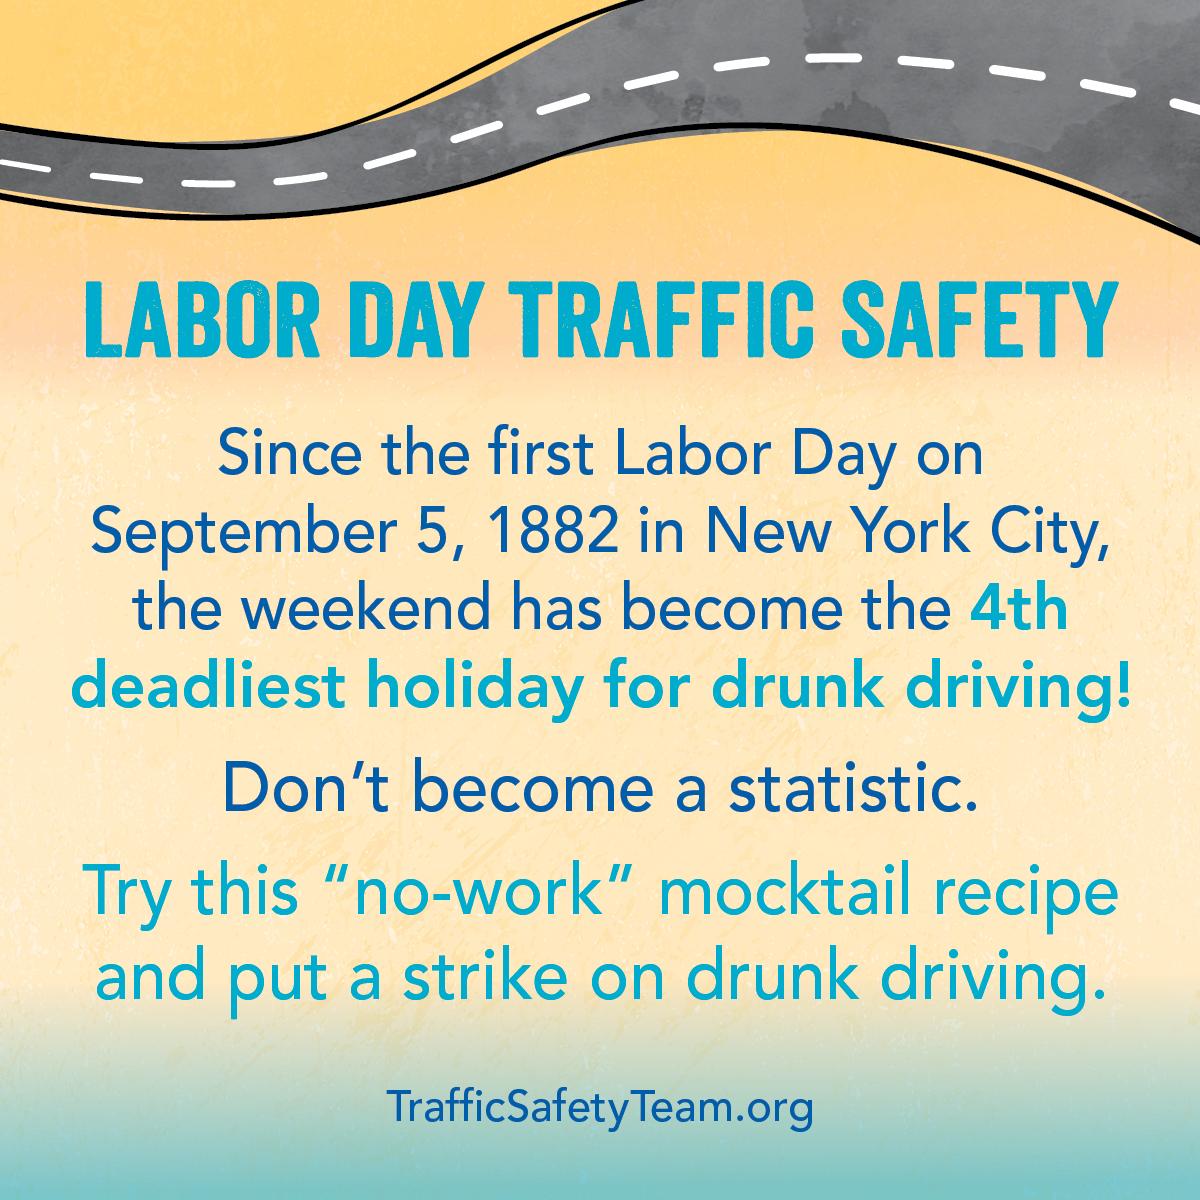 Labor Day Traffic Safety